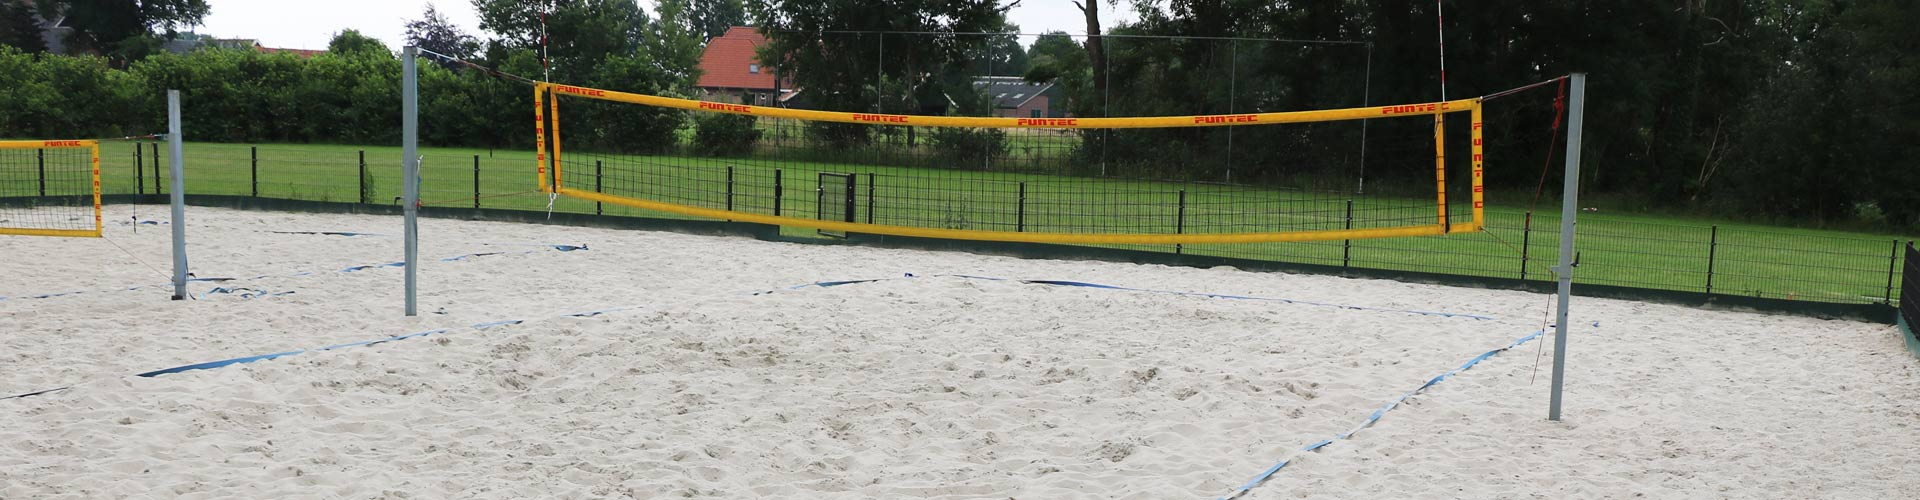 Dorpsaccommodatie Rietmolen - Beachveld